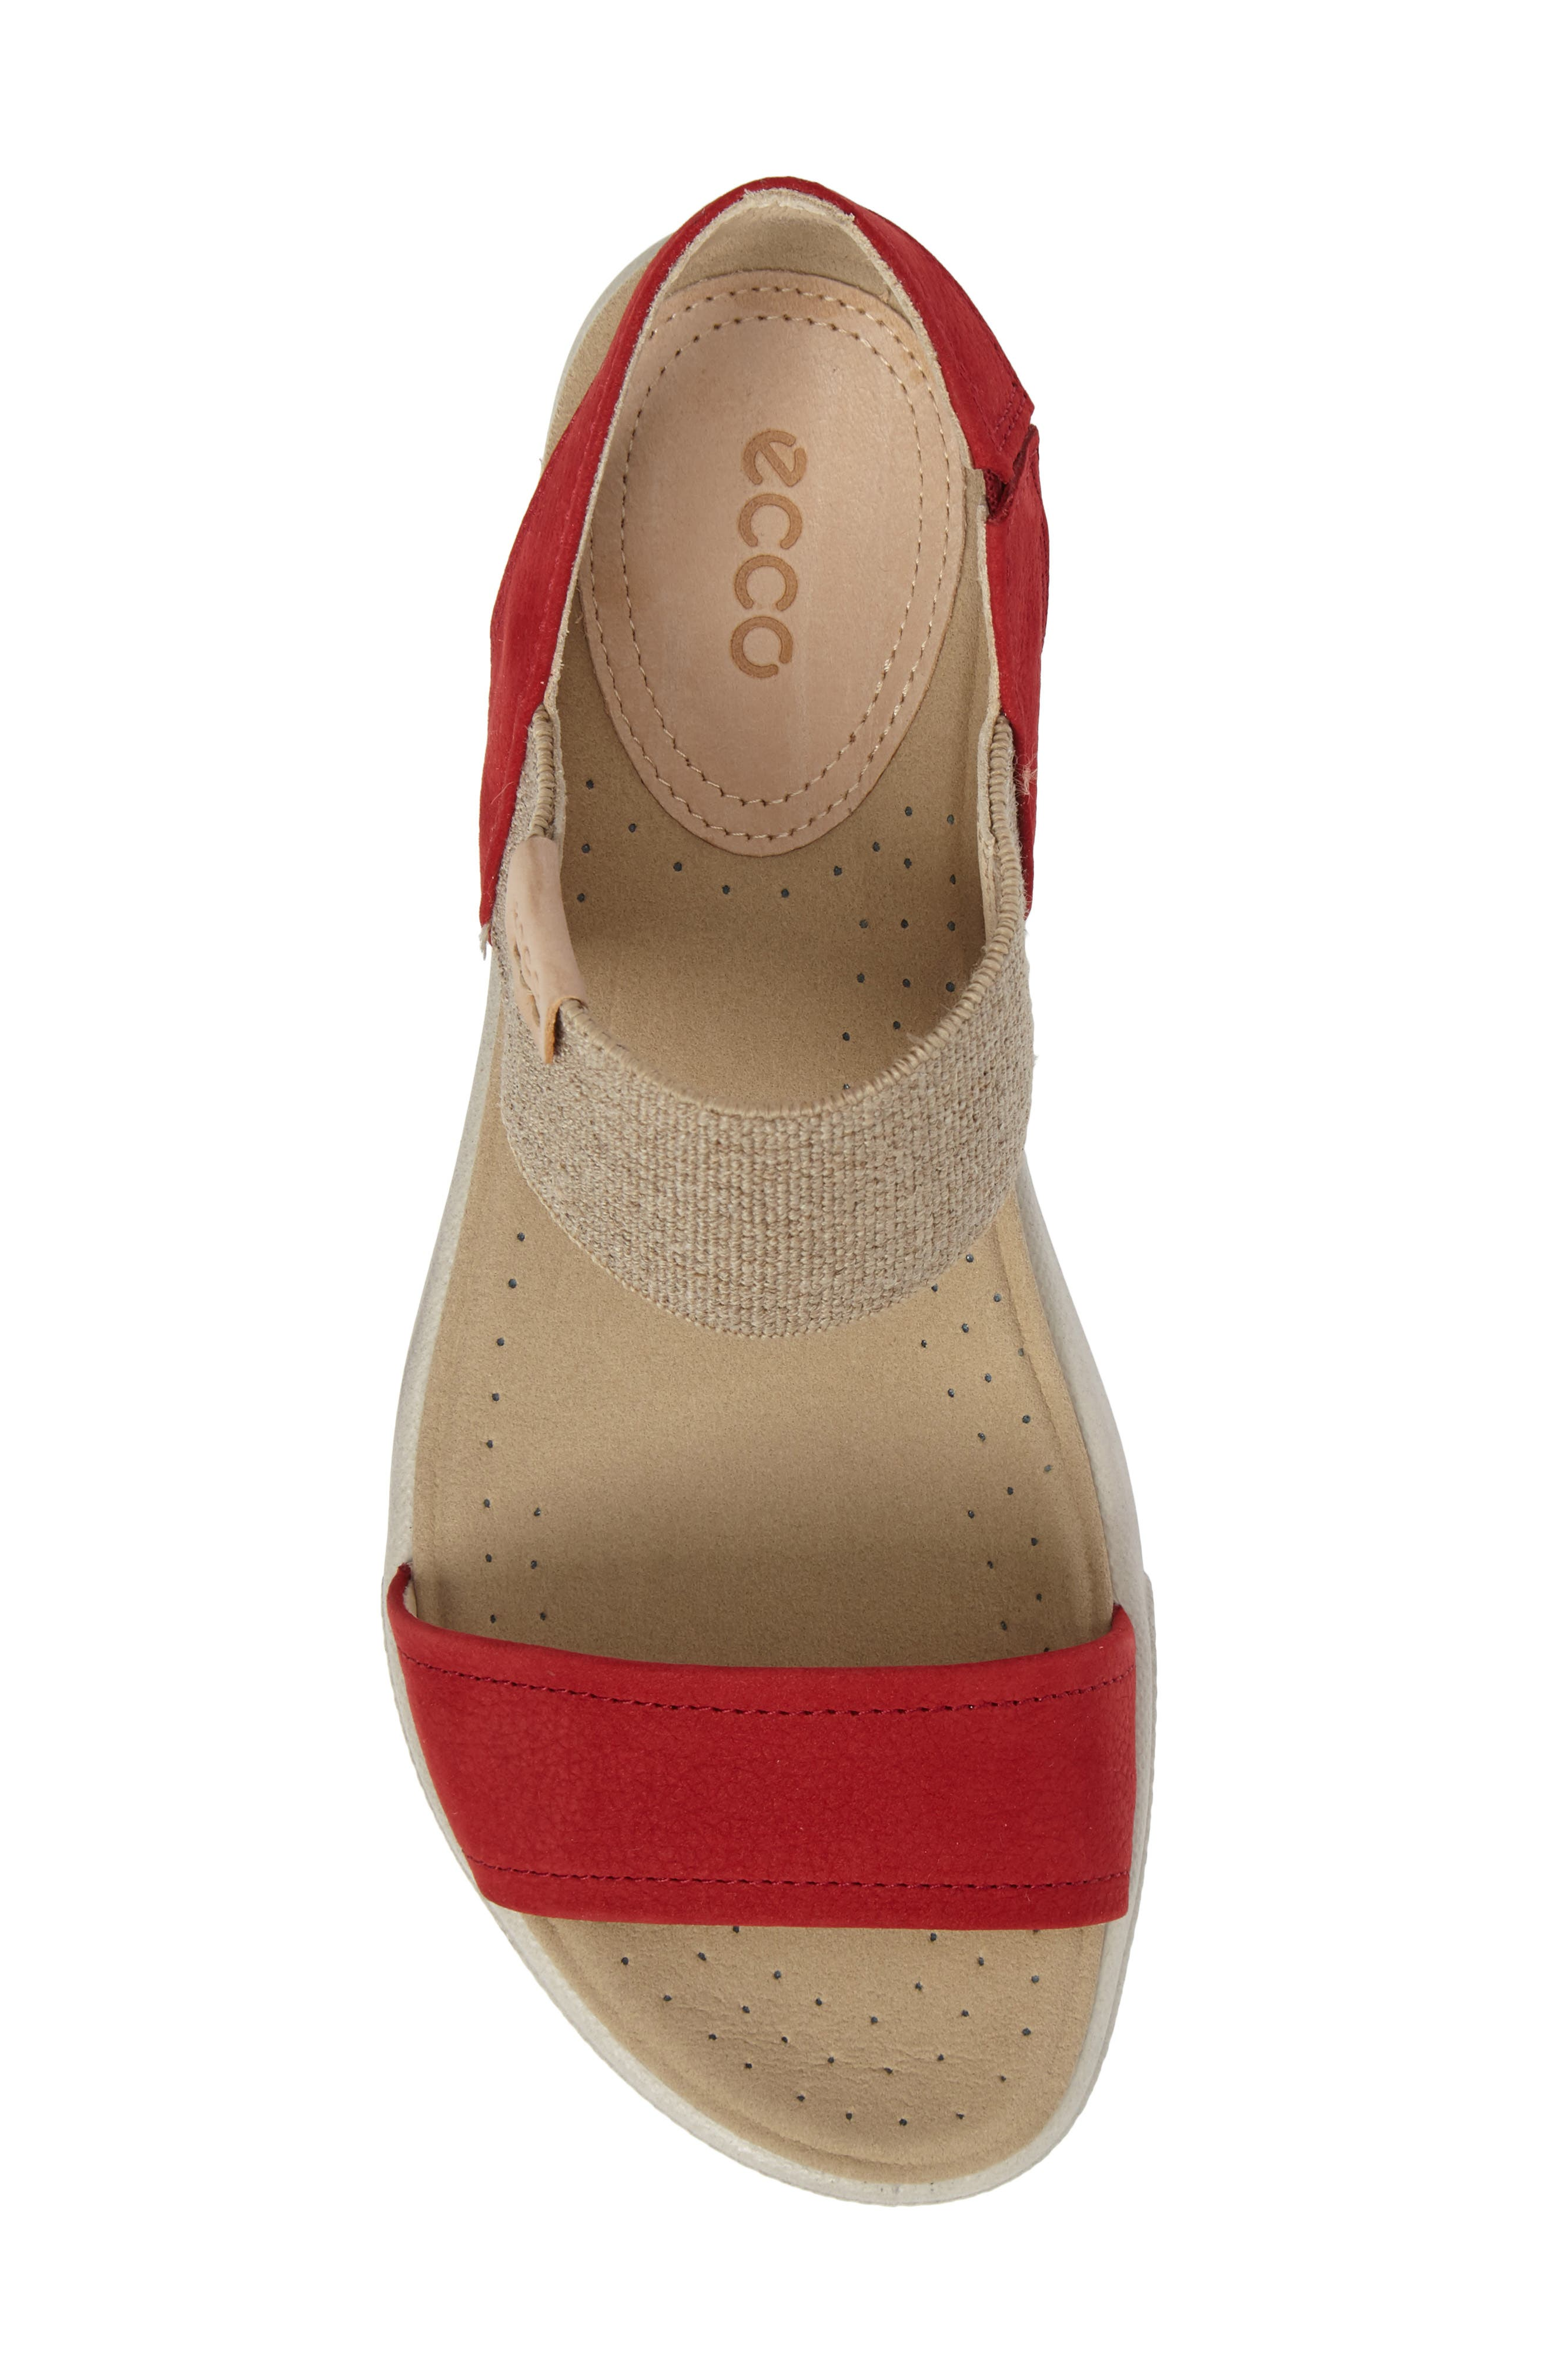 'Damara' Sandal,                             Alternate thumbnail 5, color,                             CHILI RED LEATHER